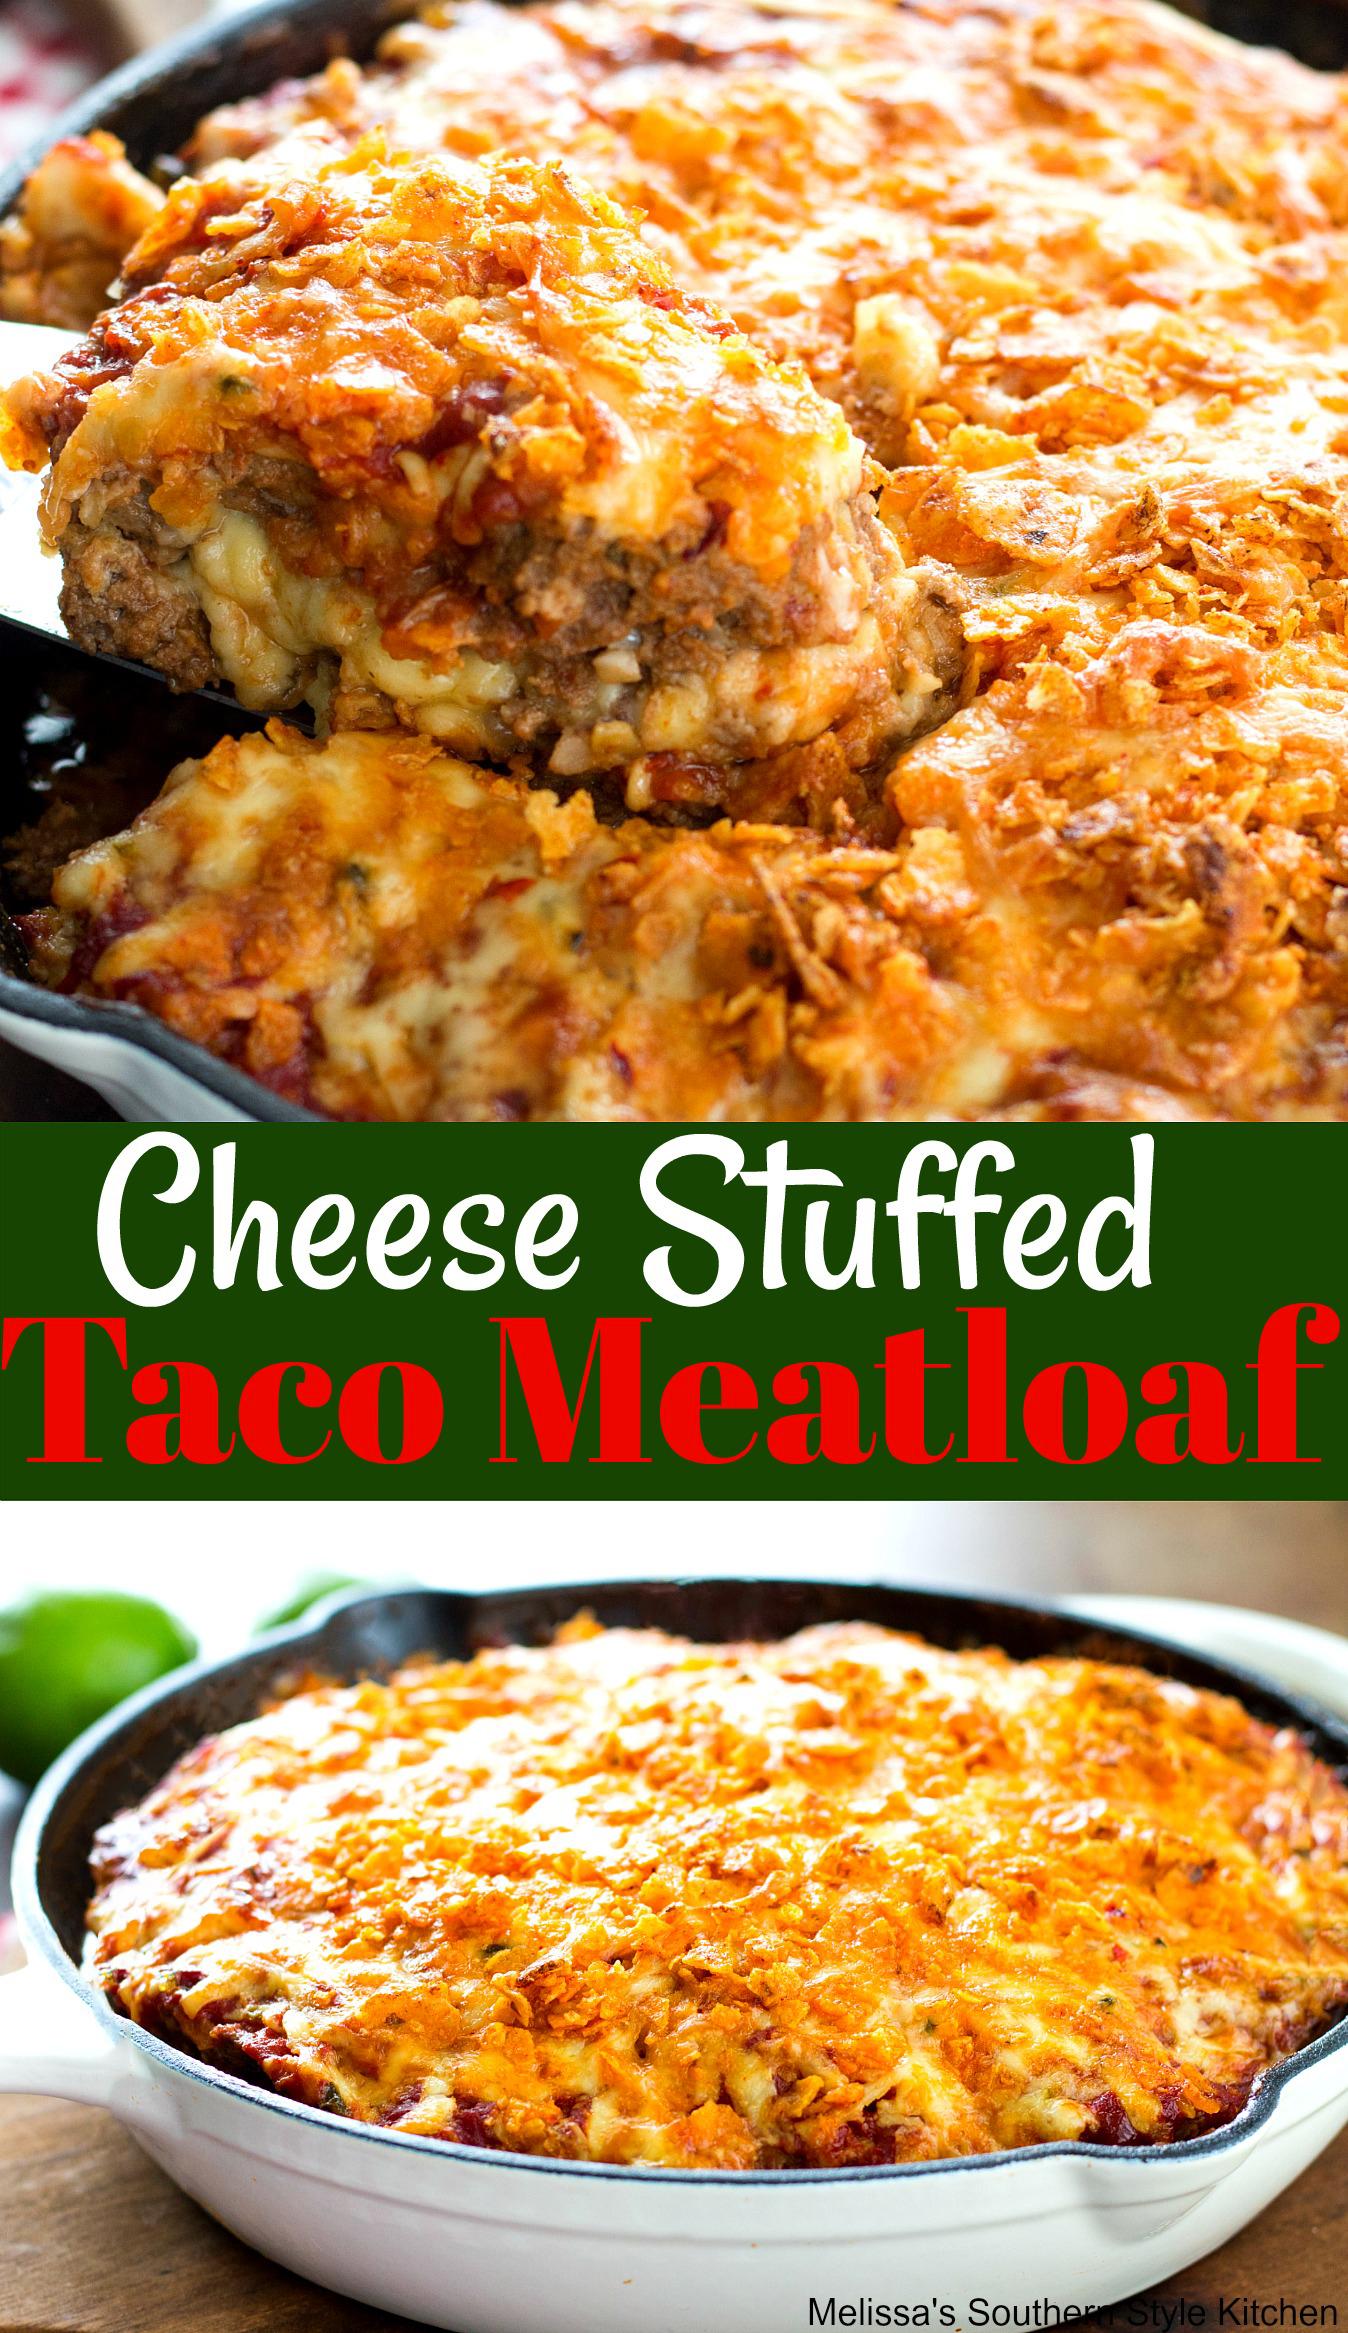 Cheese Stuffed Taco Meatloaf